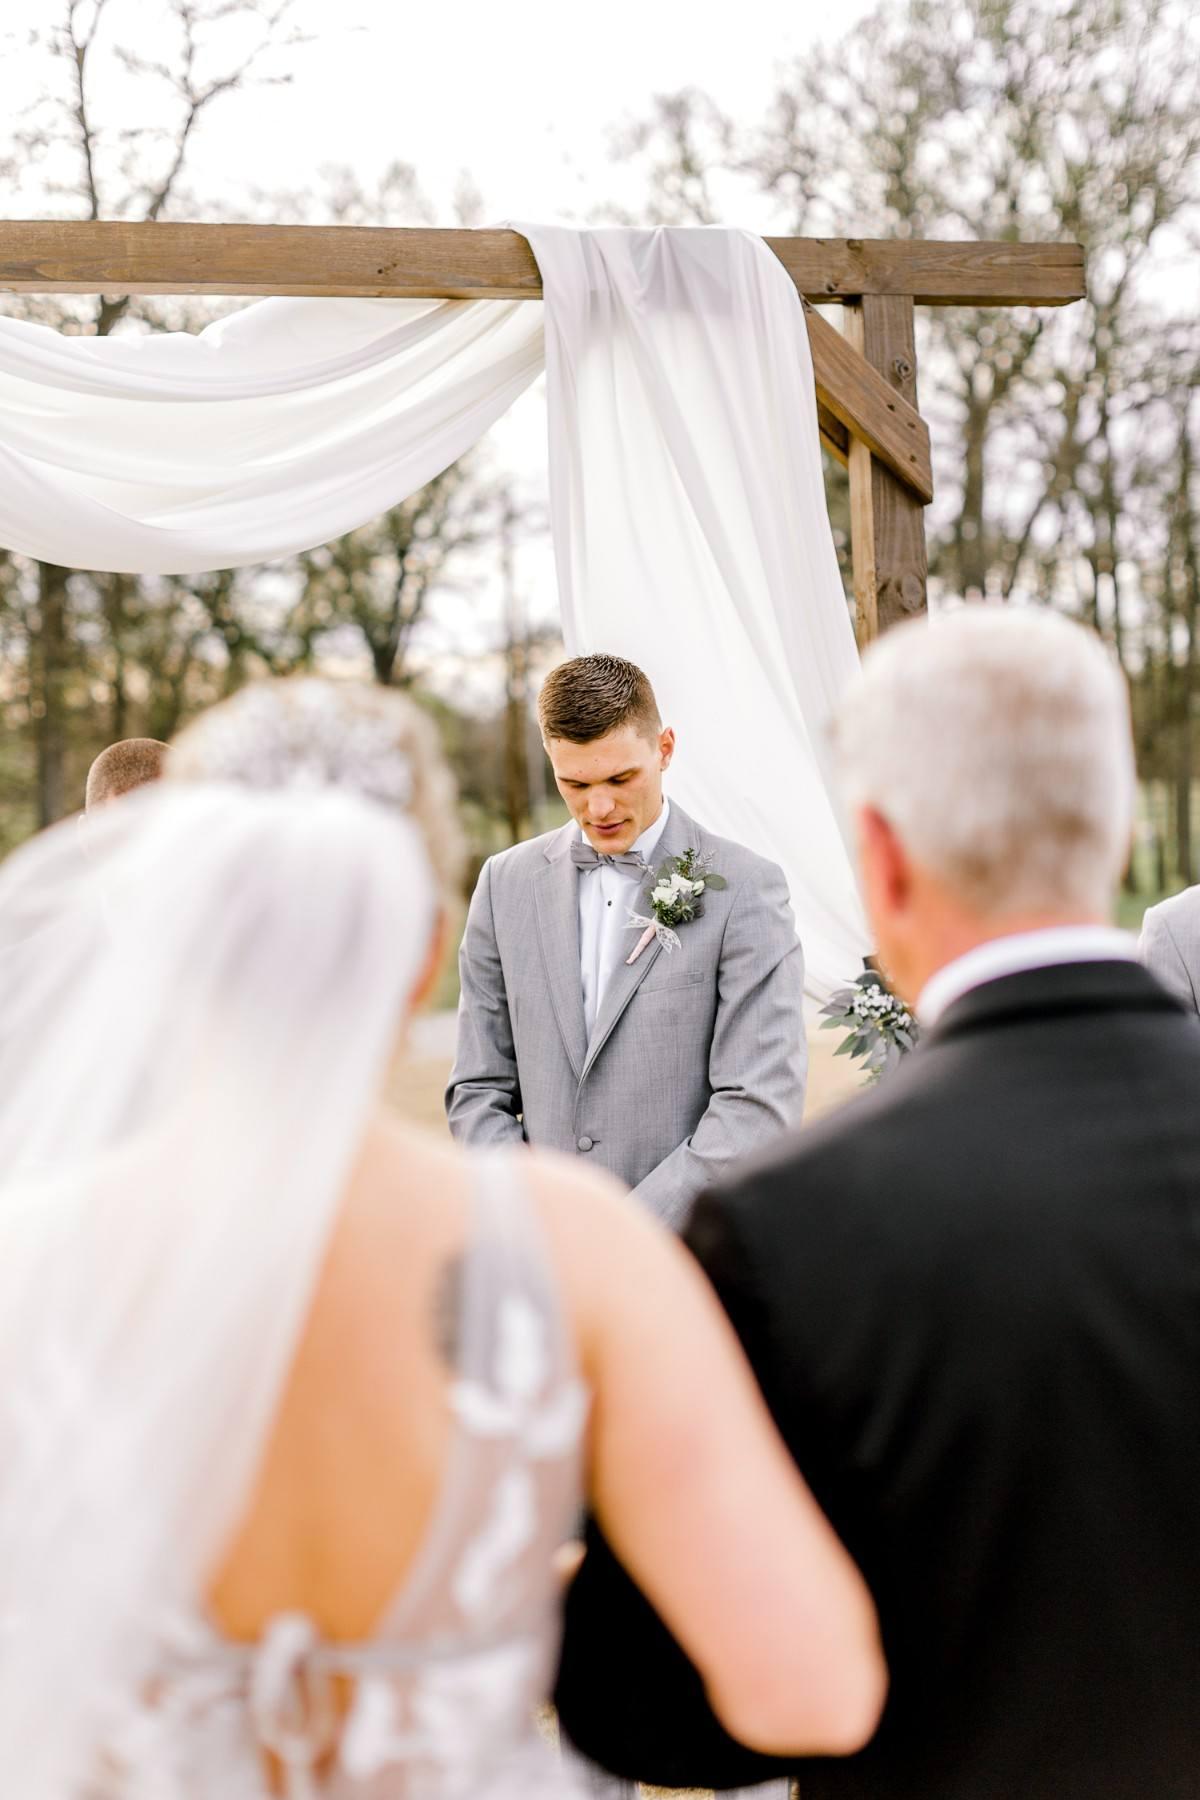 ennis-texas-wedding-photographer-kaitlyn-bullard-68.jpg